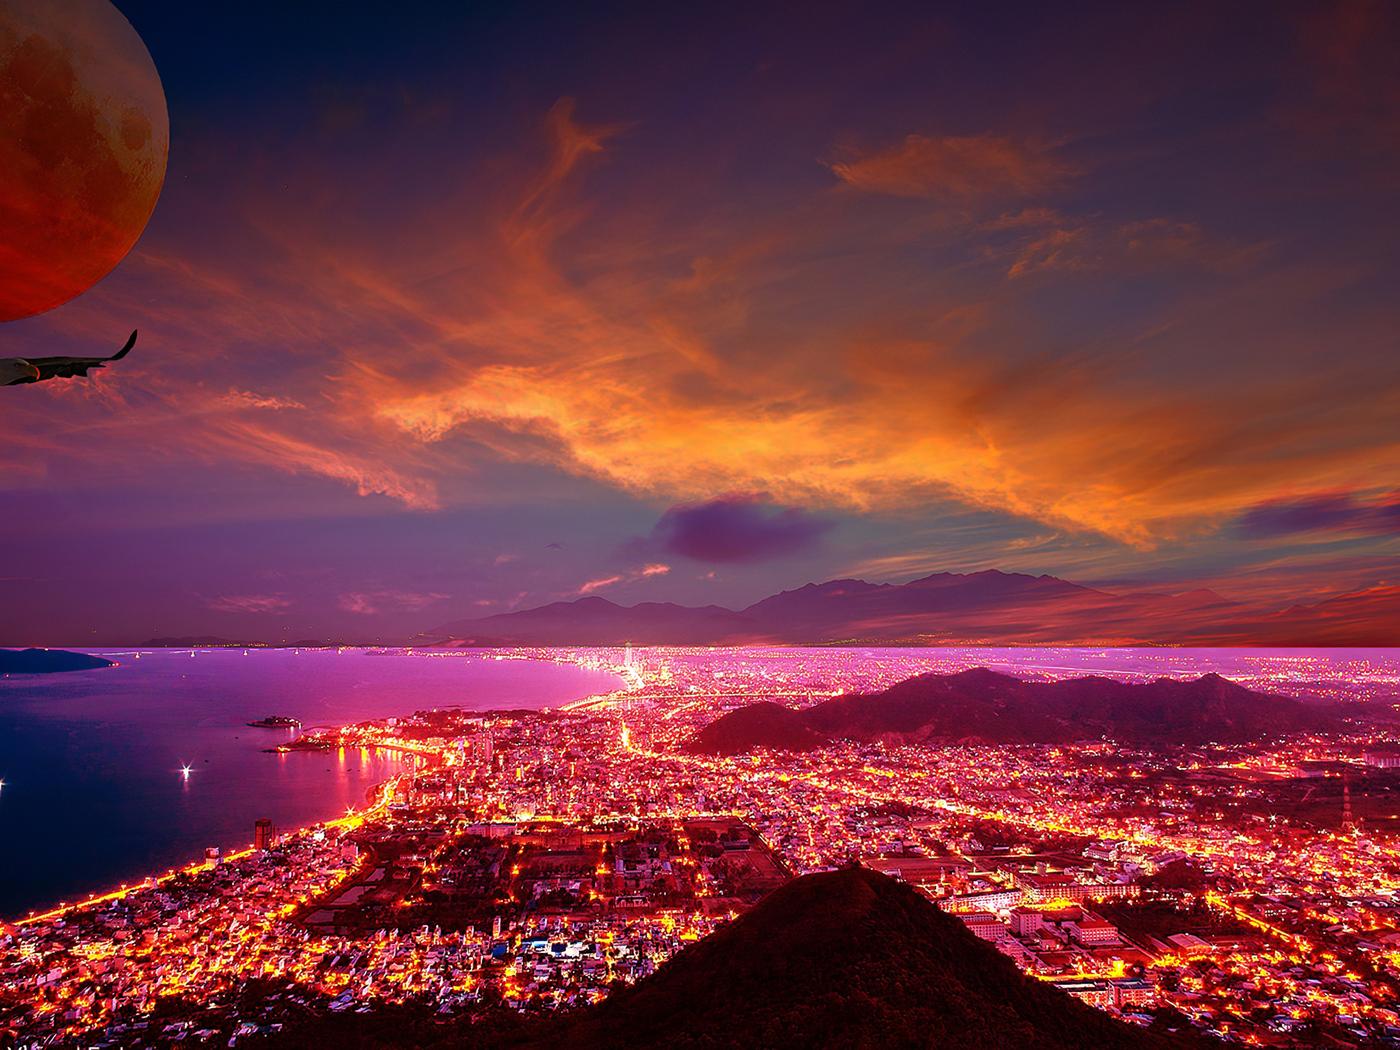 city-lights-sky-beach-5n.jpg